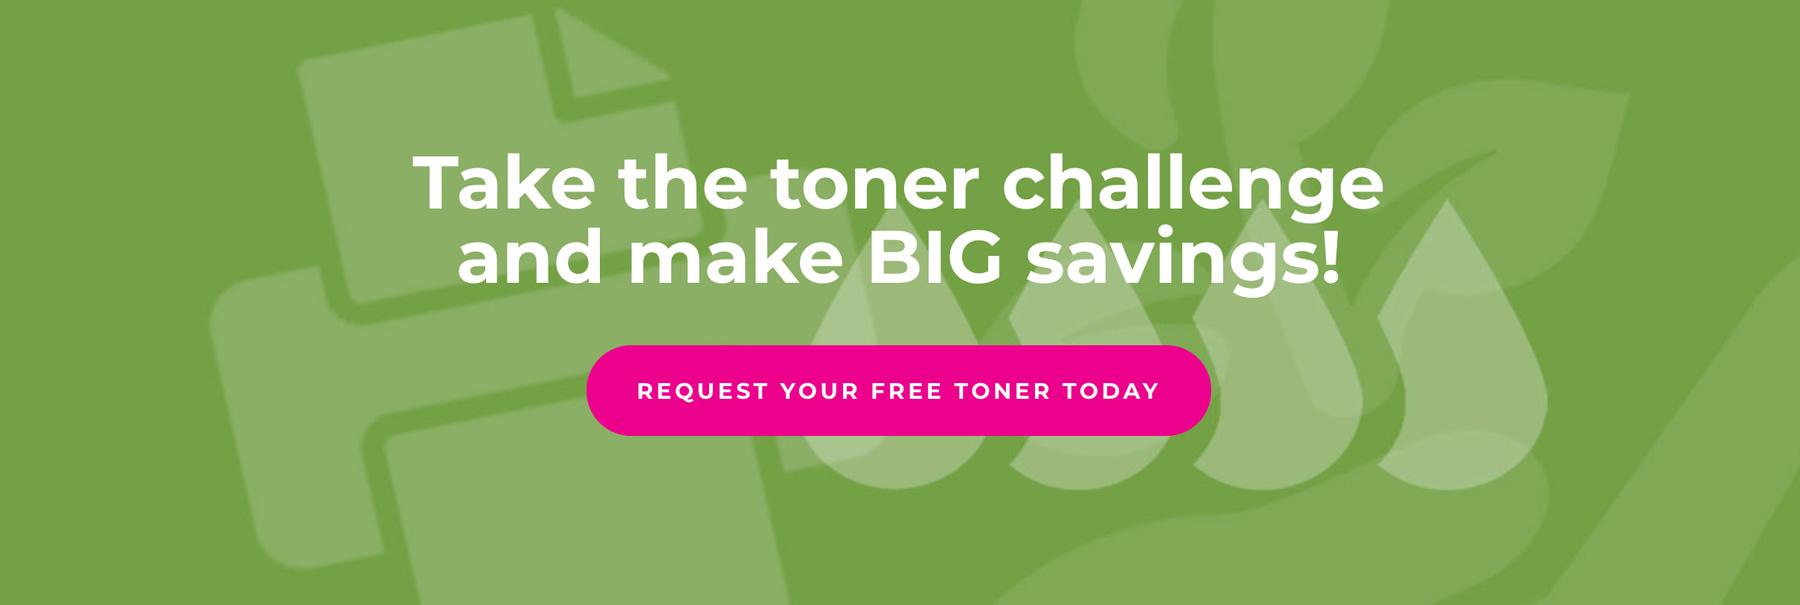 printer-toner-challenge-cta.jpg